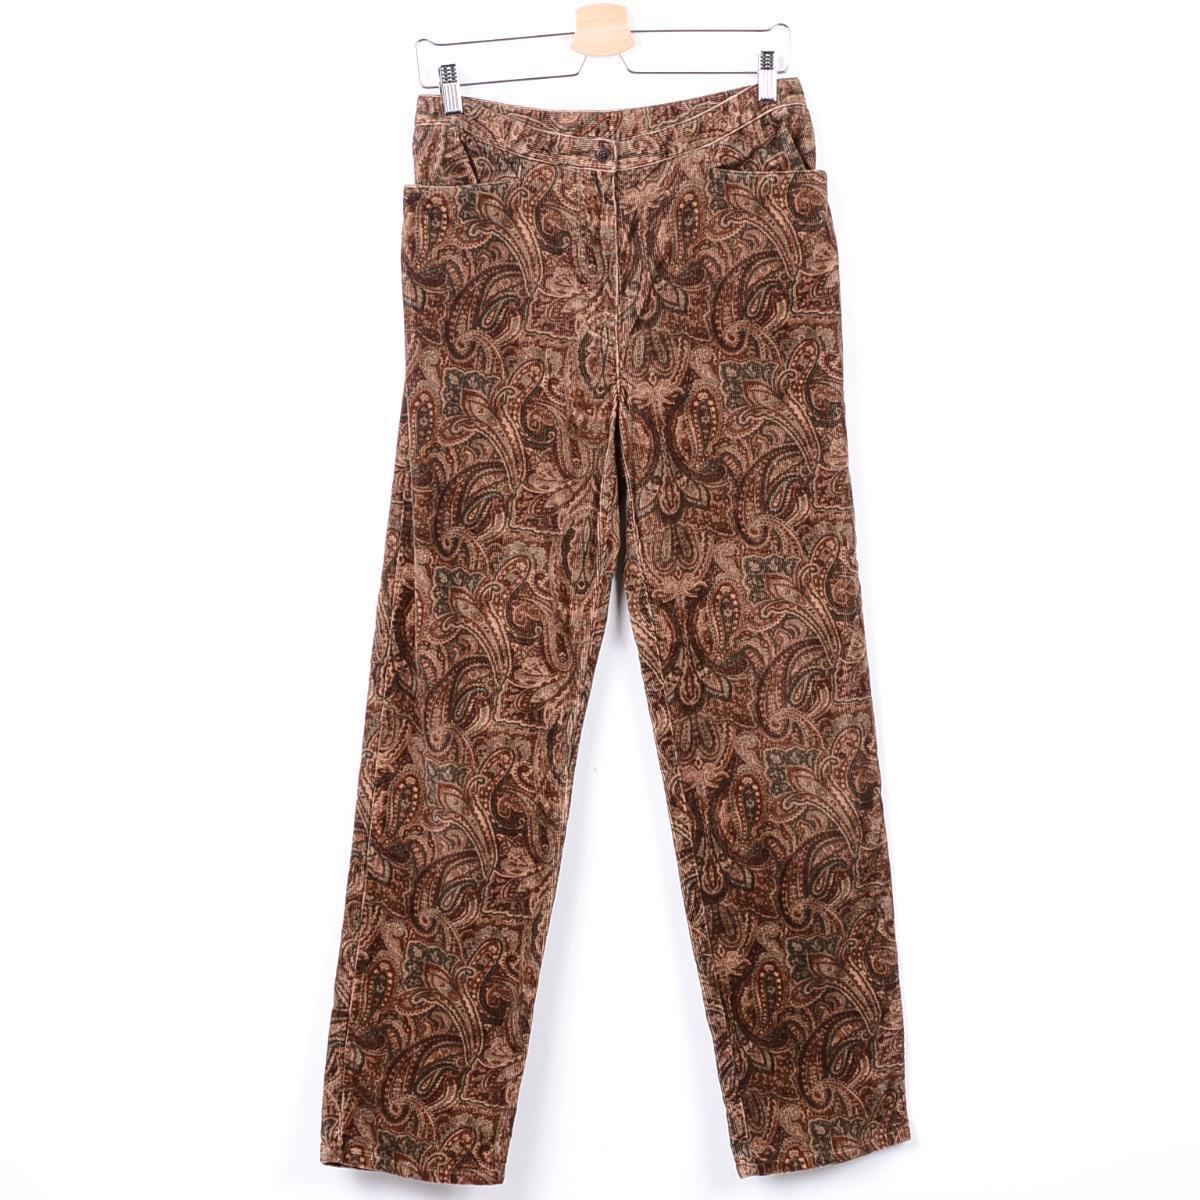 VINTAGE CLOTHING JAM TRADING | Rakuten Global Market: Ralph LAUREN ...